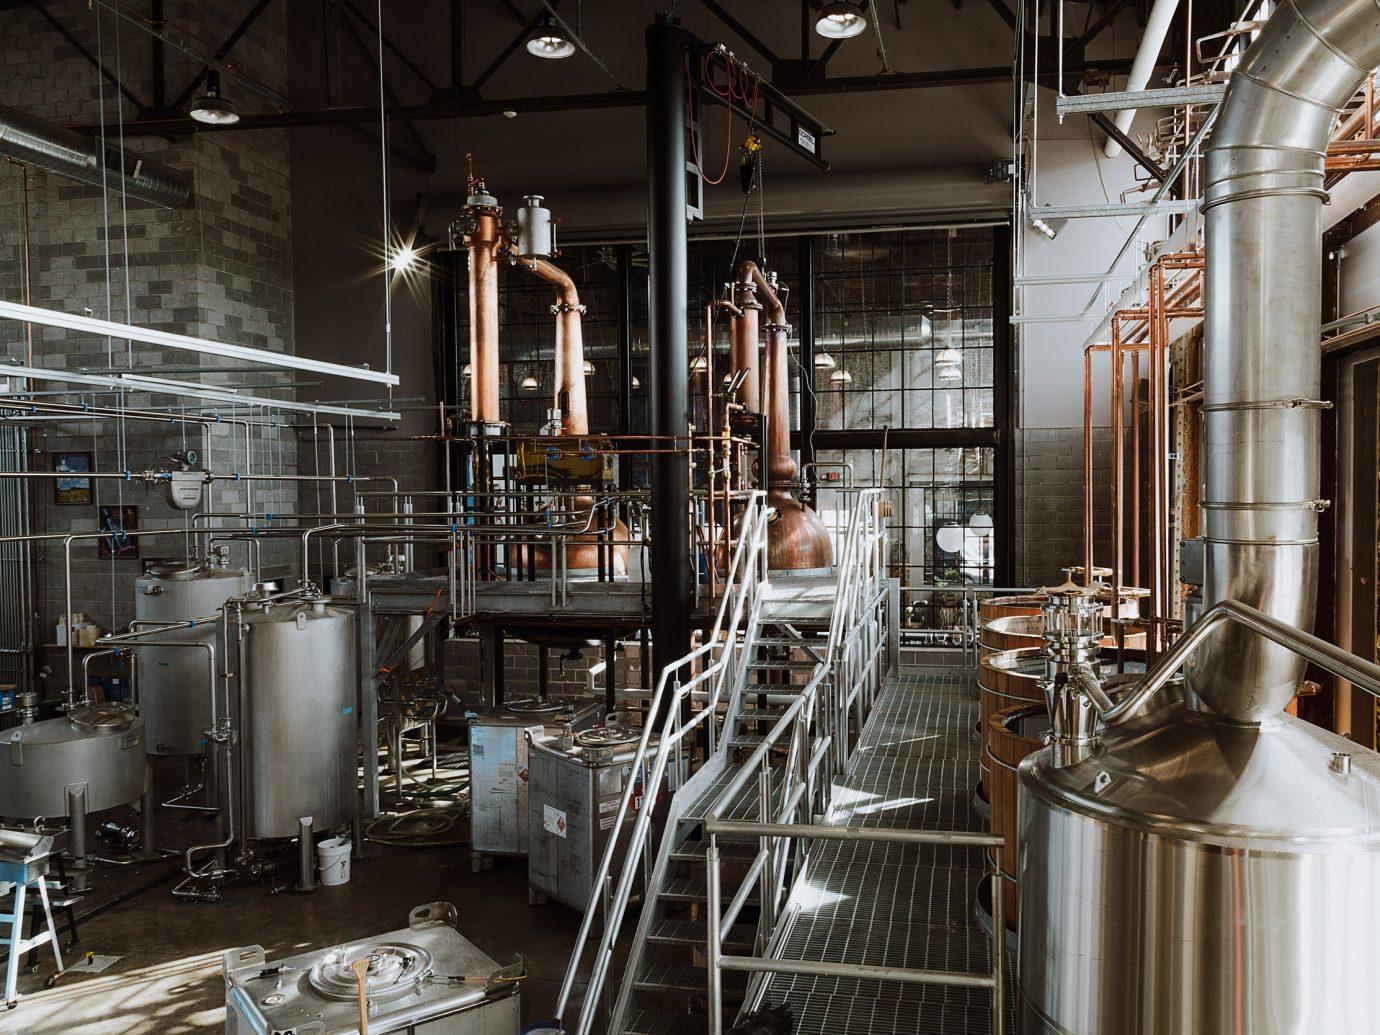 Food + Drink indoor brewery industry metal factory cooking